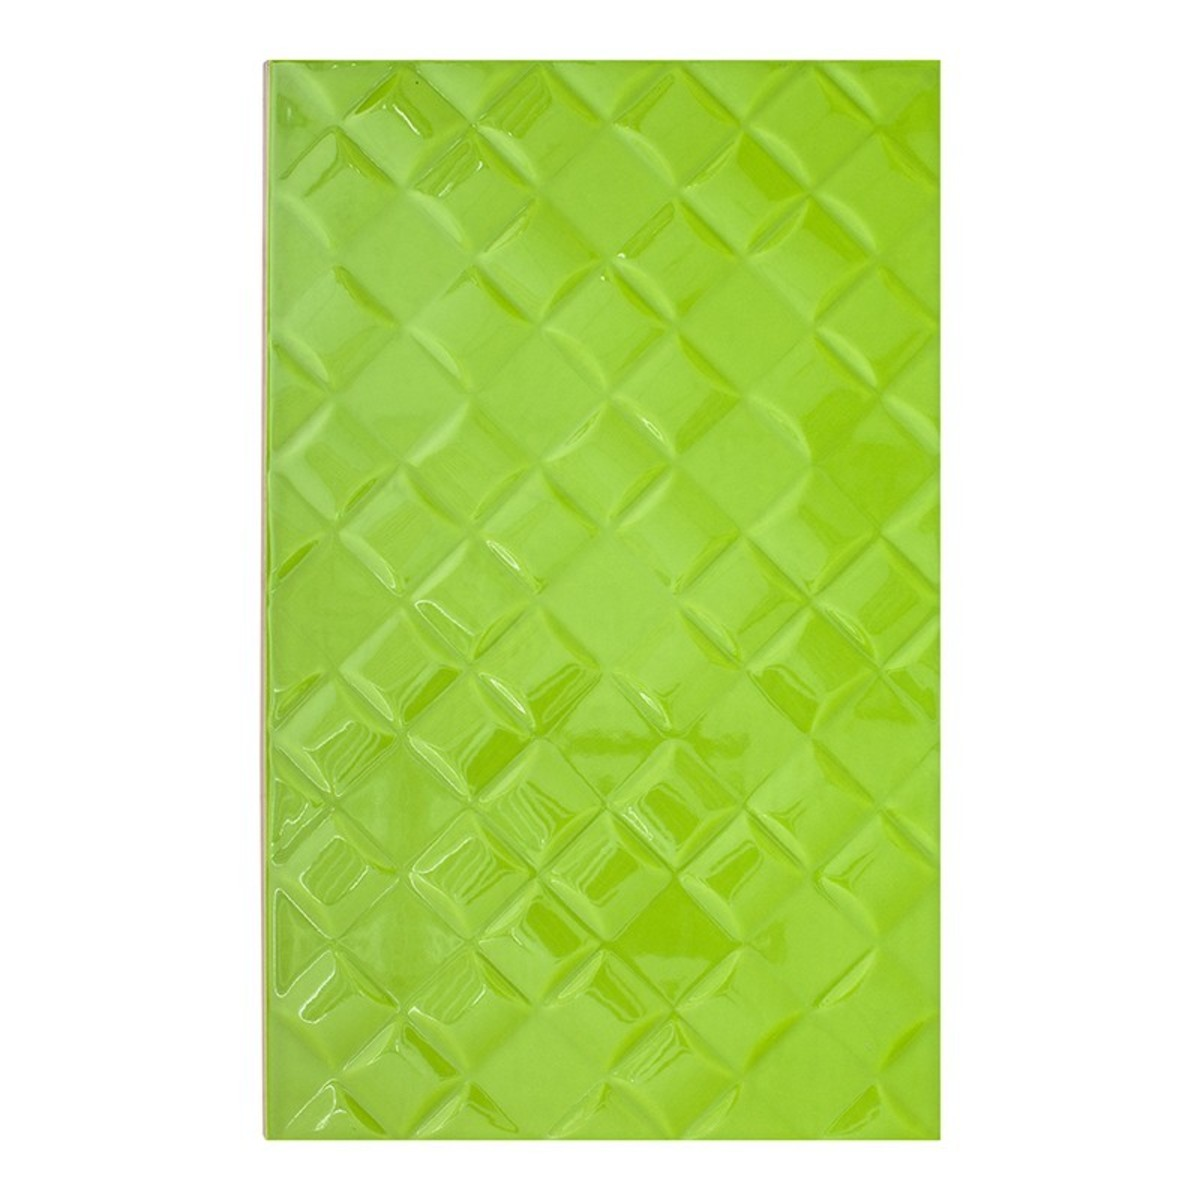 Плитка настенная Golden Tile Relax 25х40 см 1.5 м2 цвет зеленый